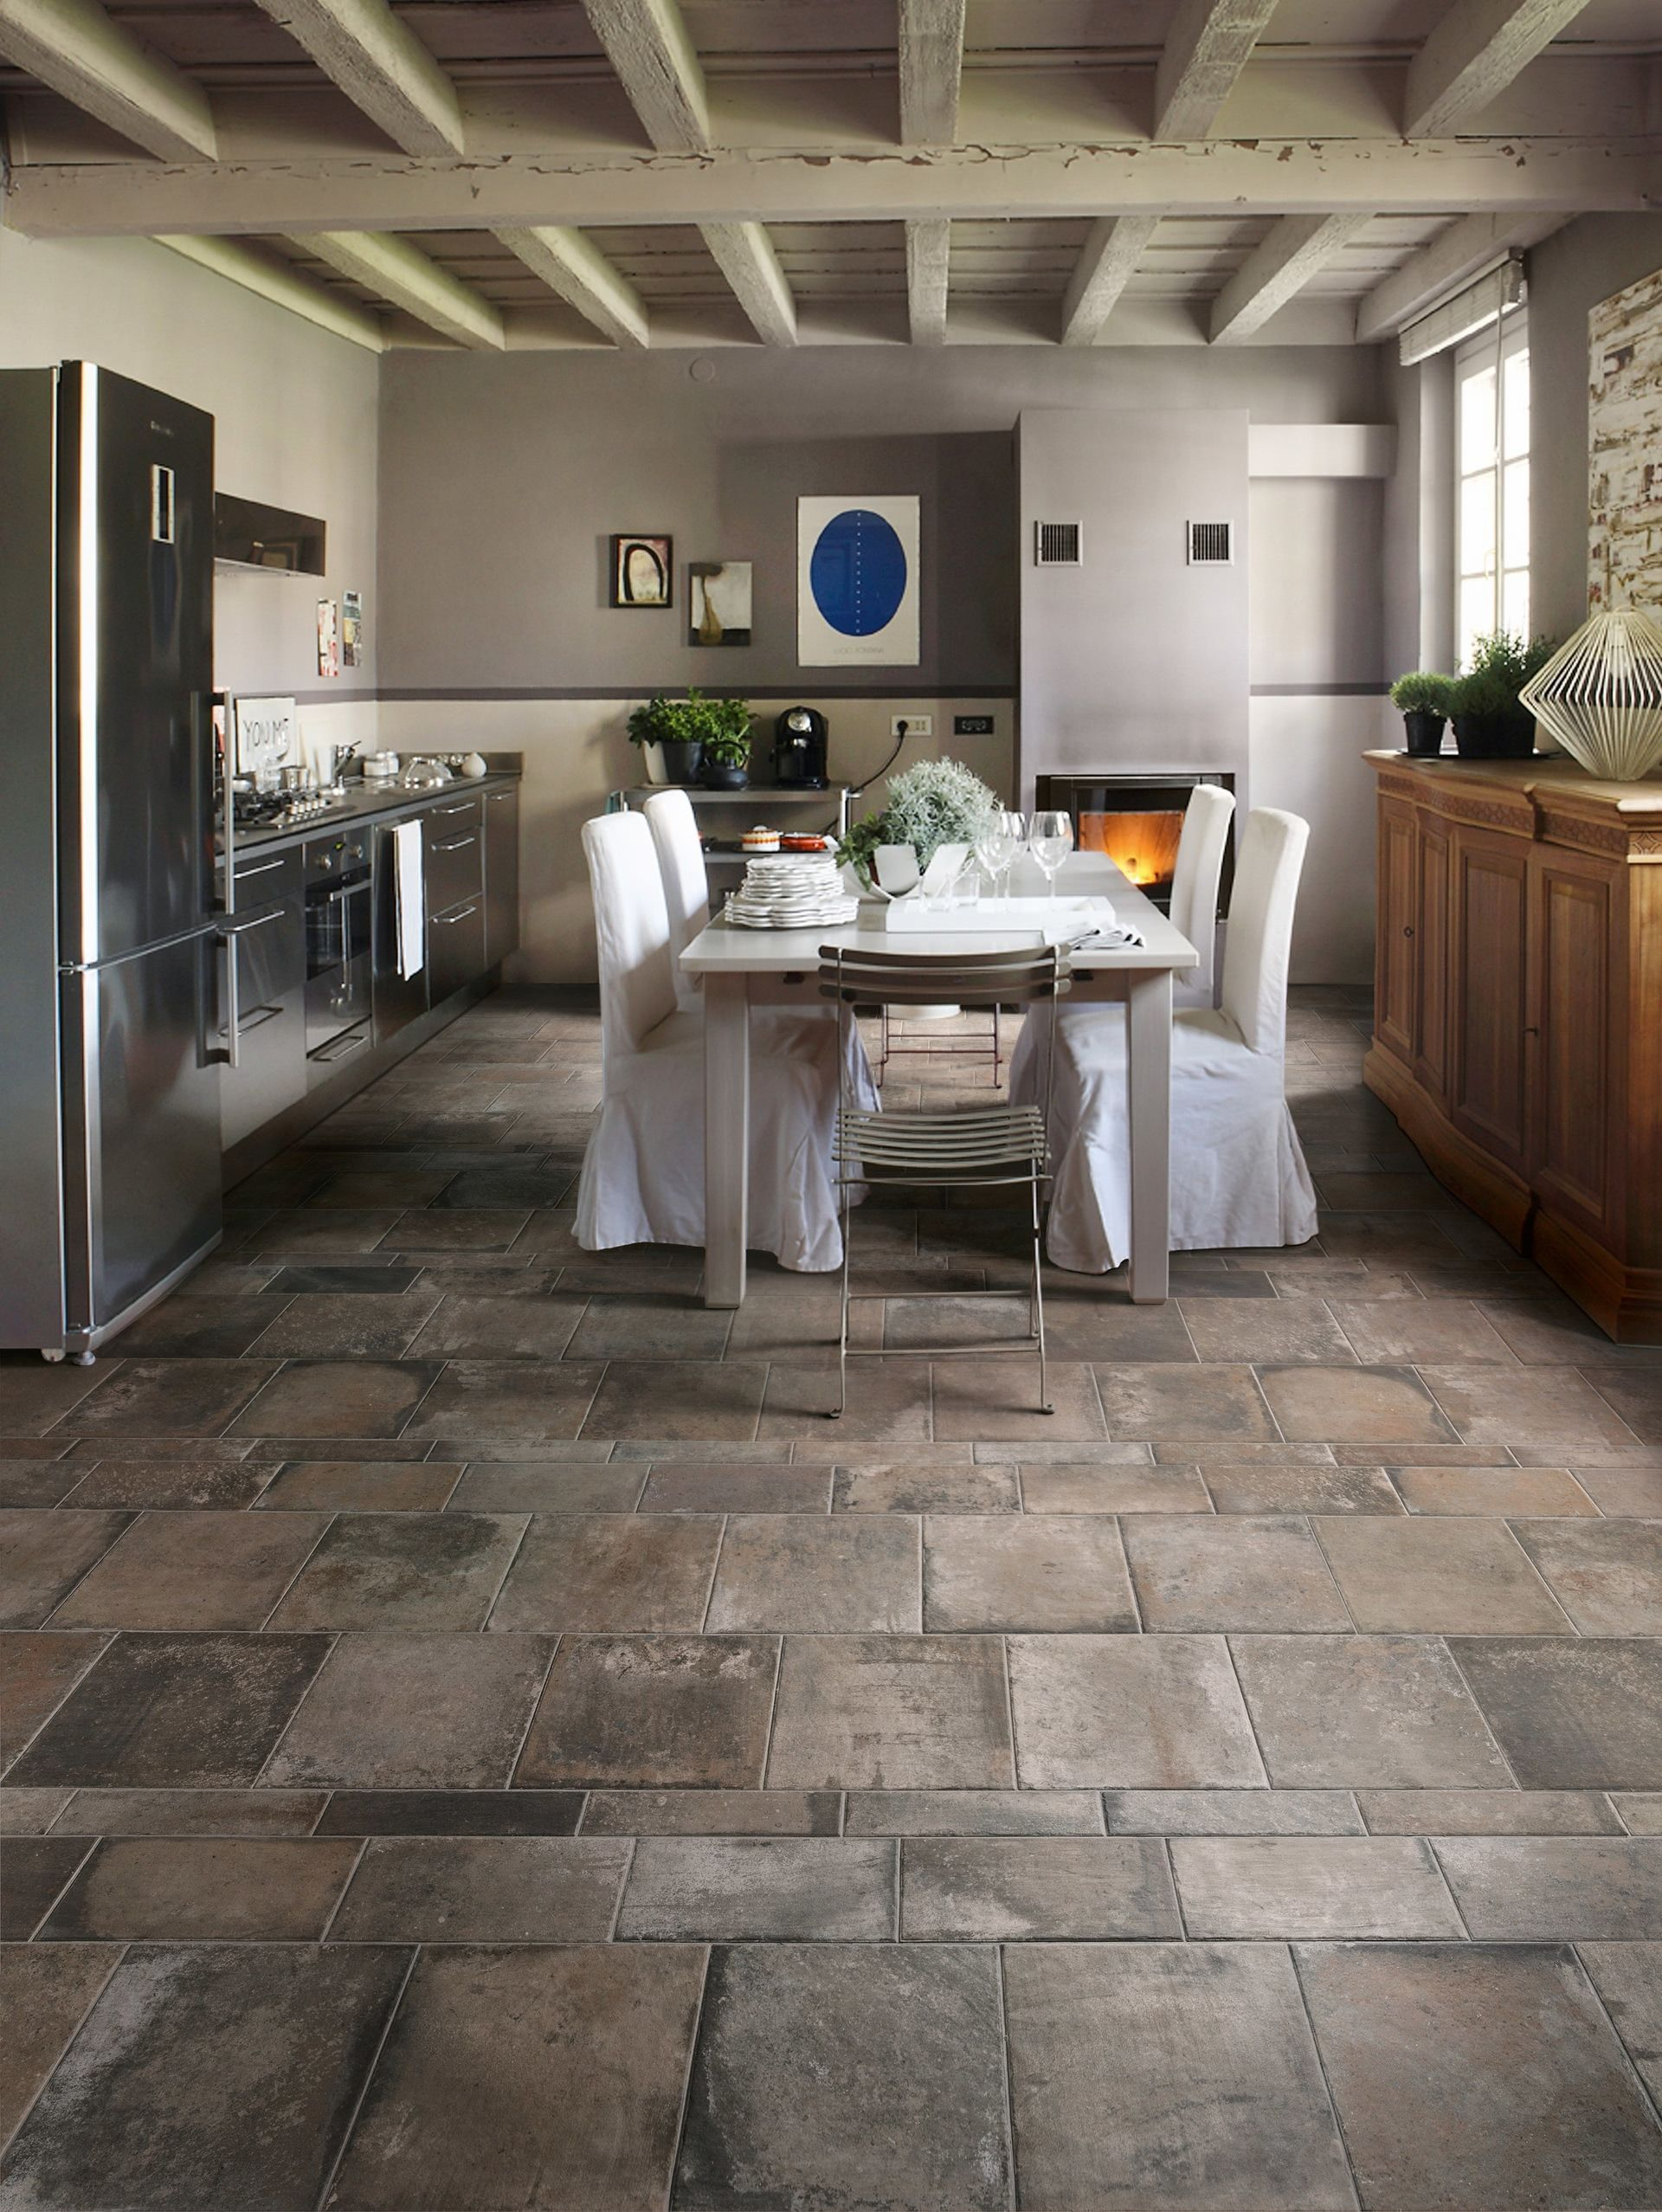 Kitchen Floor Tile (Retro, Commercial, Marble Kitchen ...